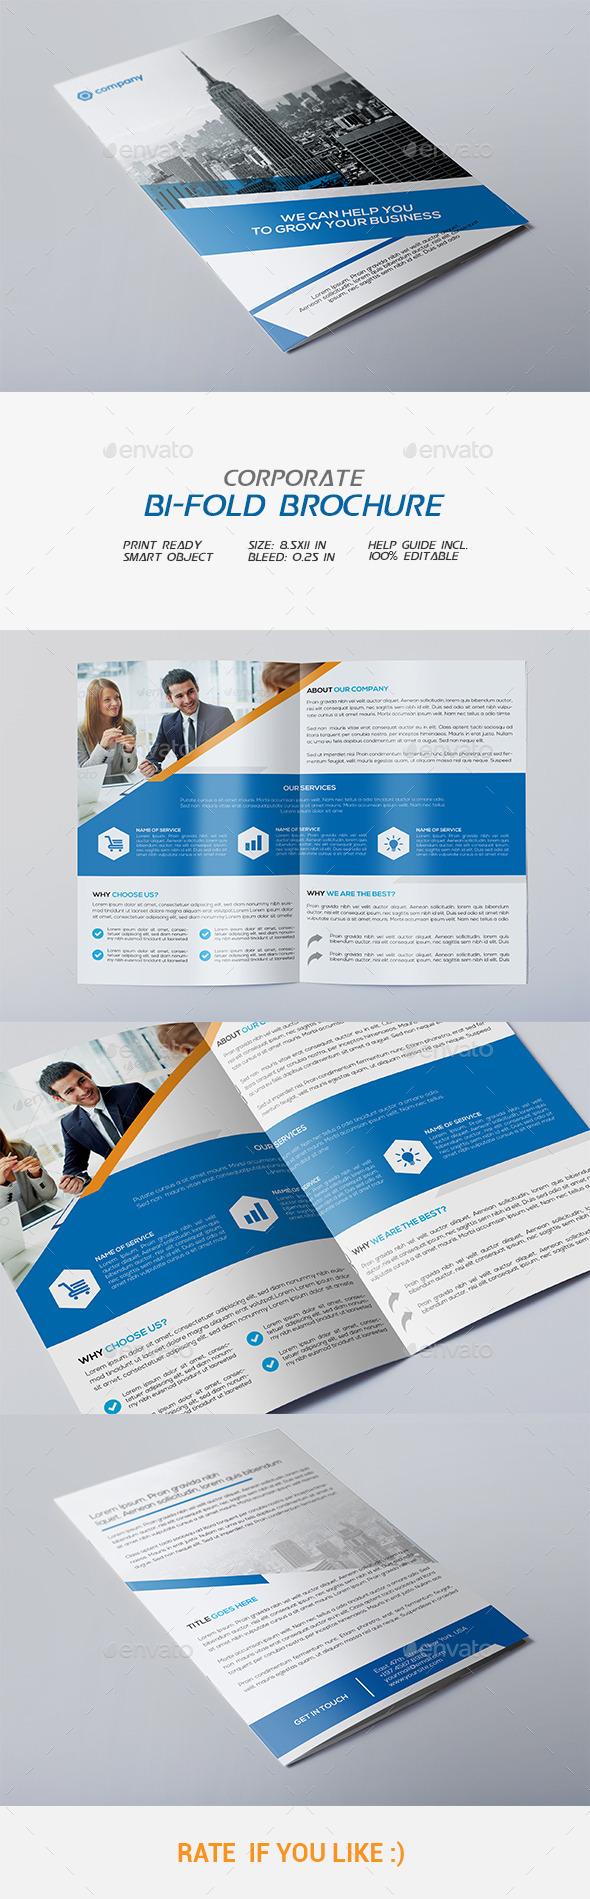 GraphicRiver Corporate Bi-fold Brochure 11975241